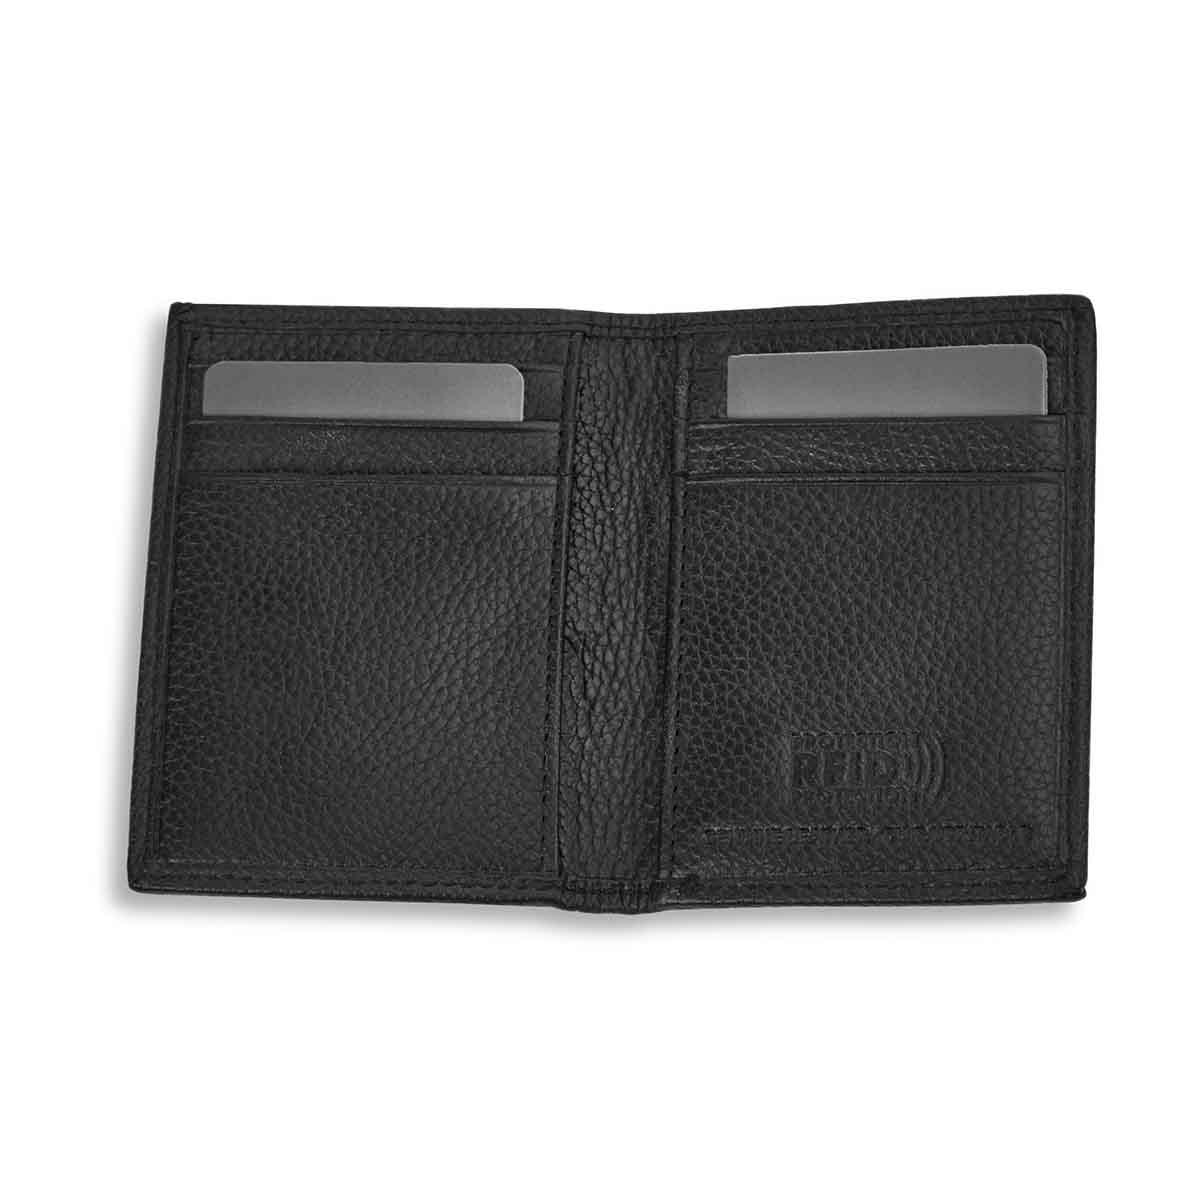 Mns black RFID slim card case wallet